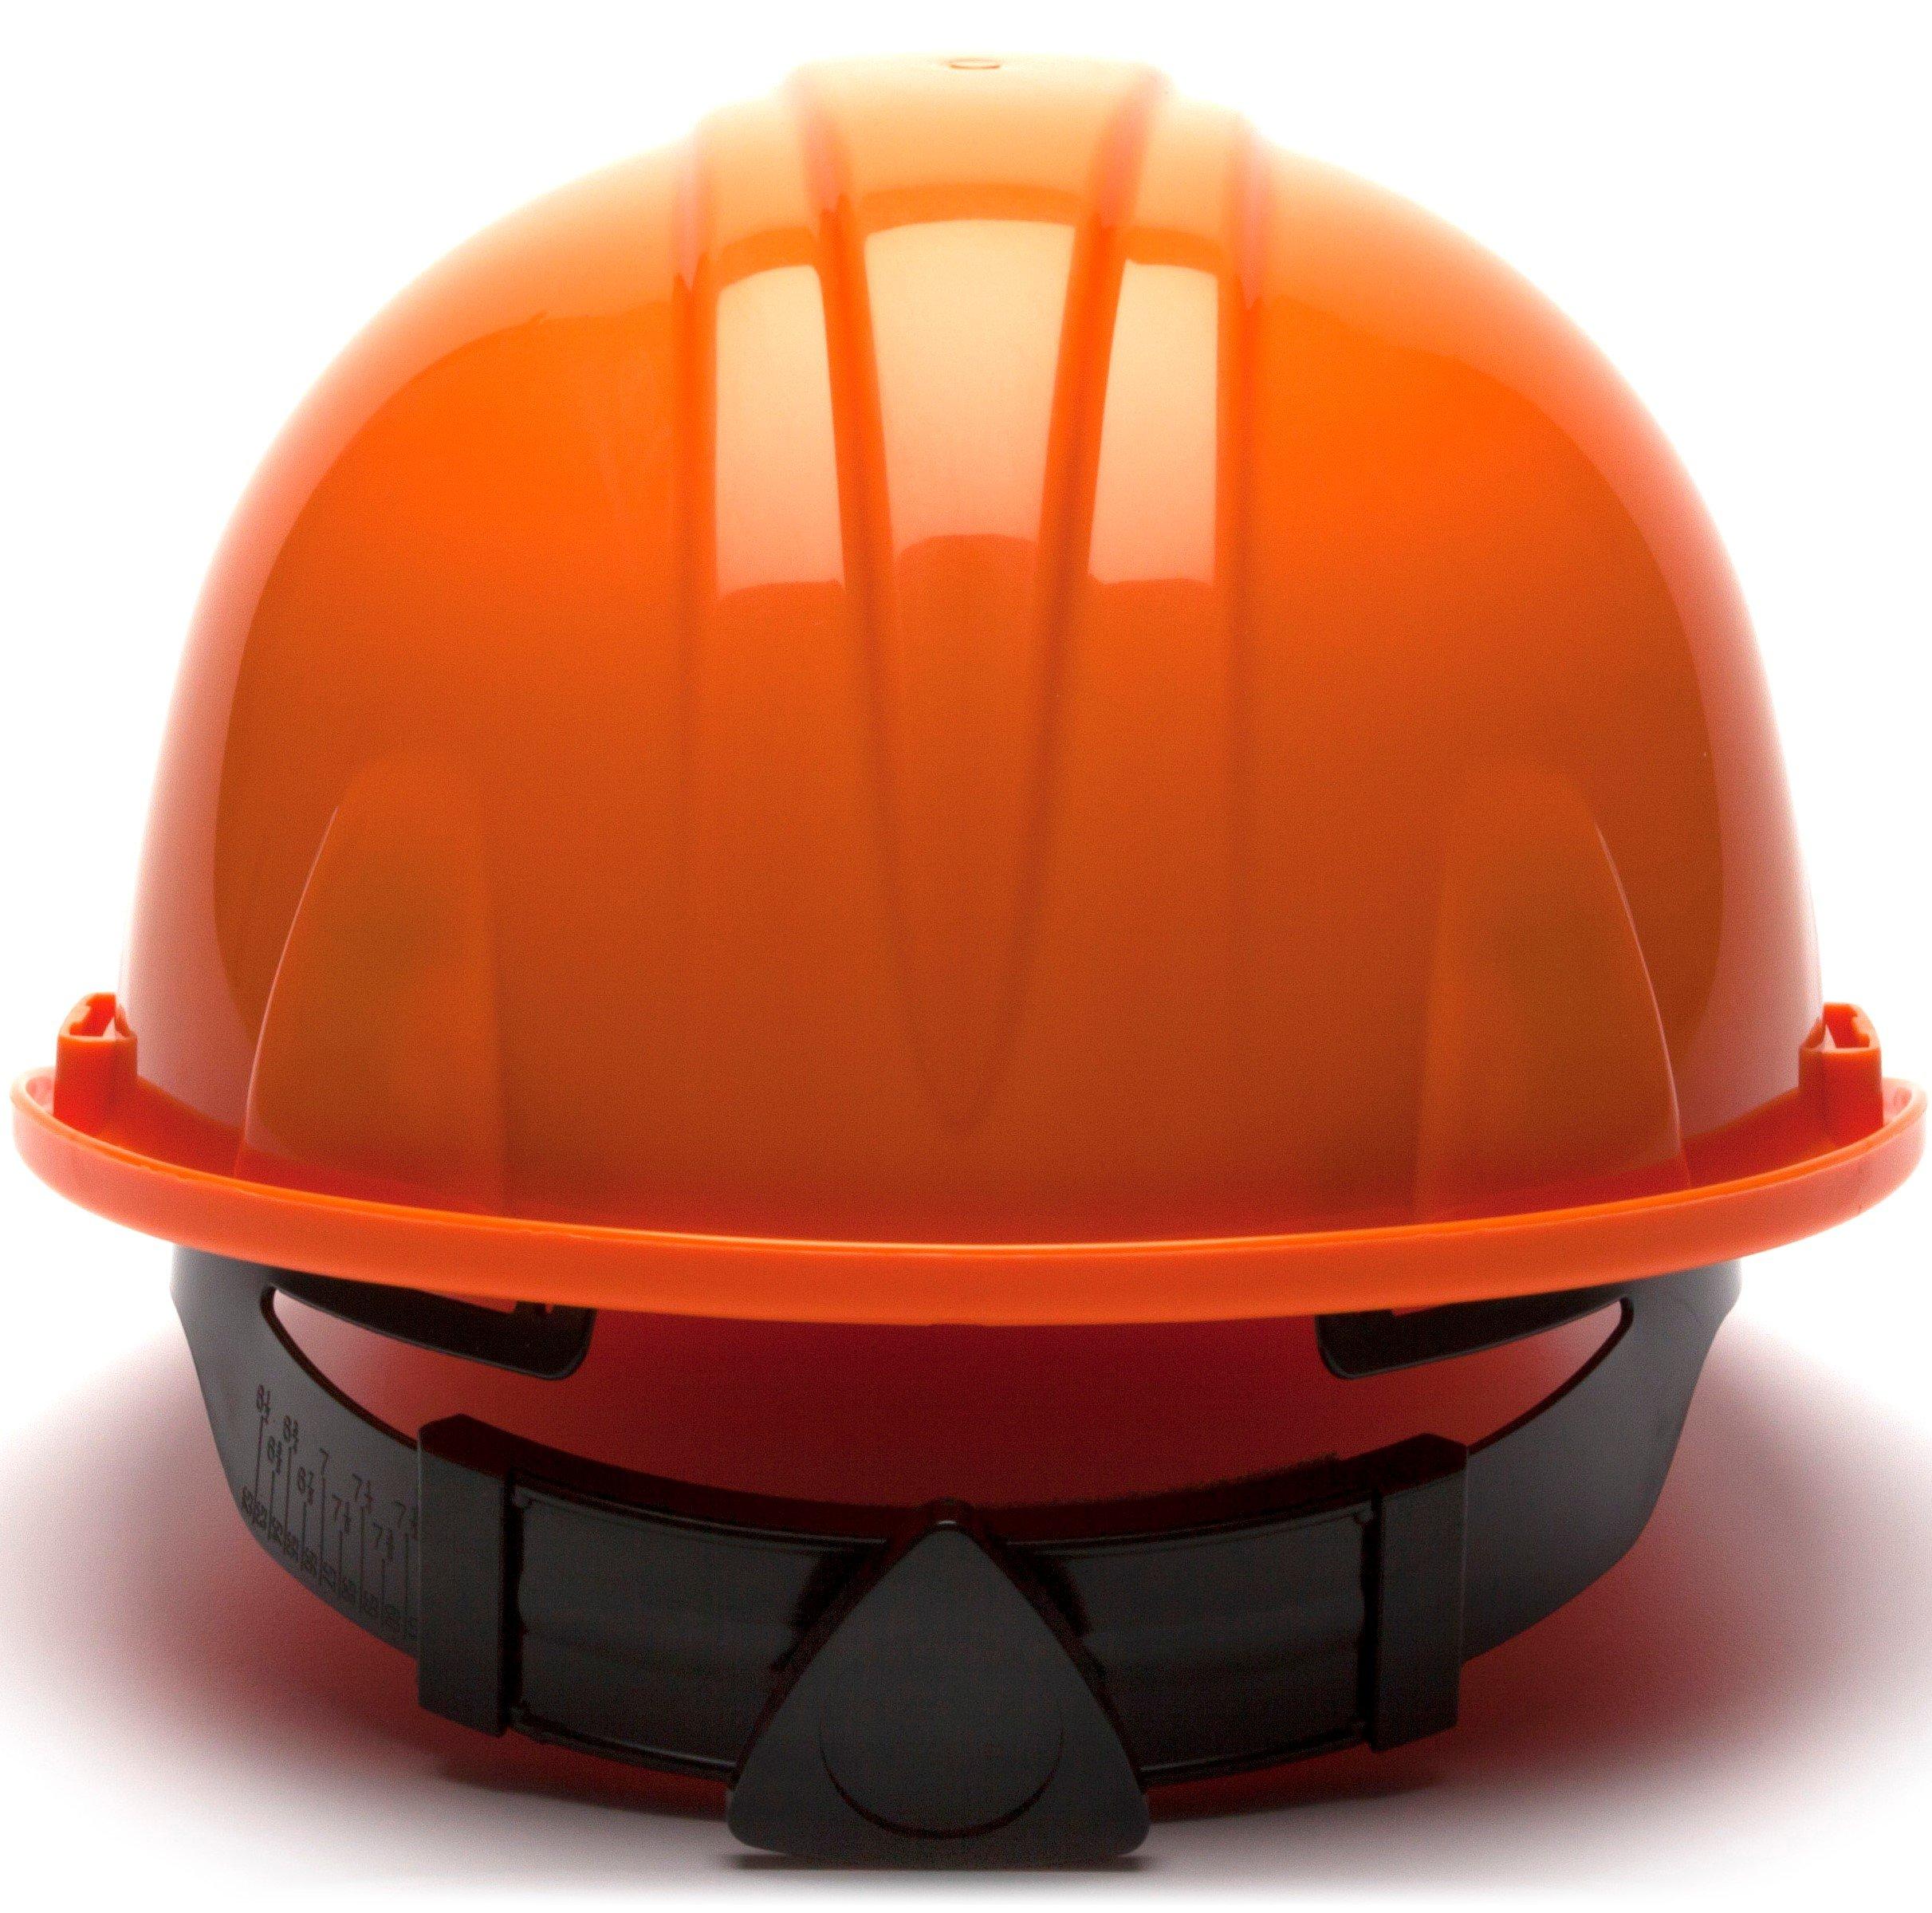 Pyramex Standard Shell Snap Lock Suspension Hard Hat, 4 Point Snap Lock Suspension, Orange by Pyramex Safety (Image #4)